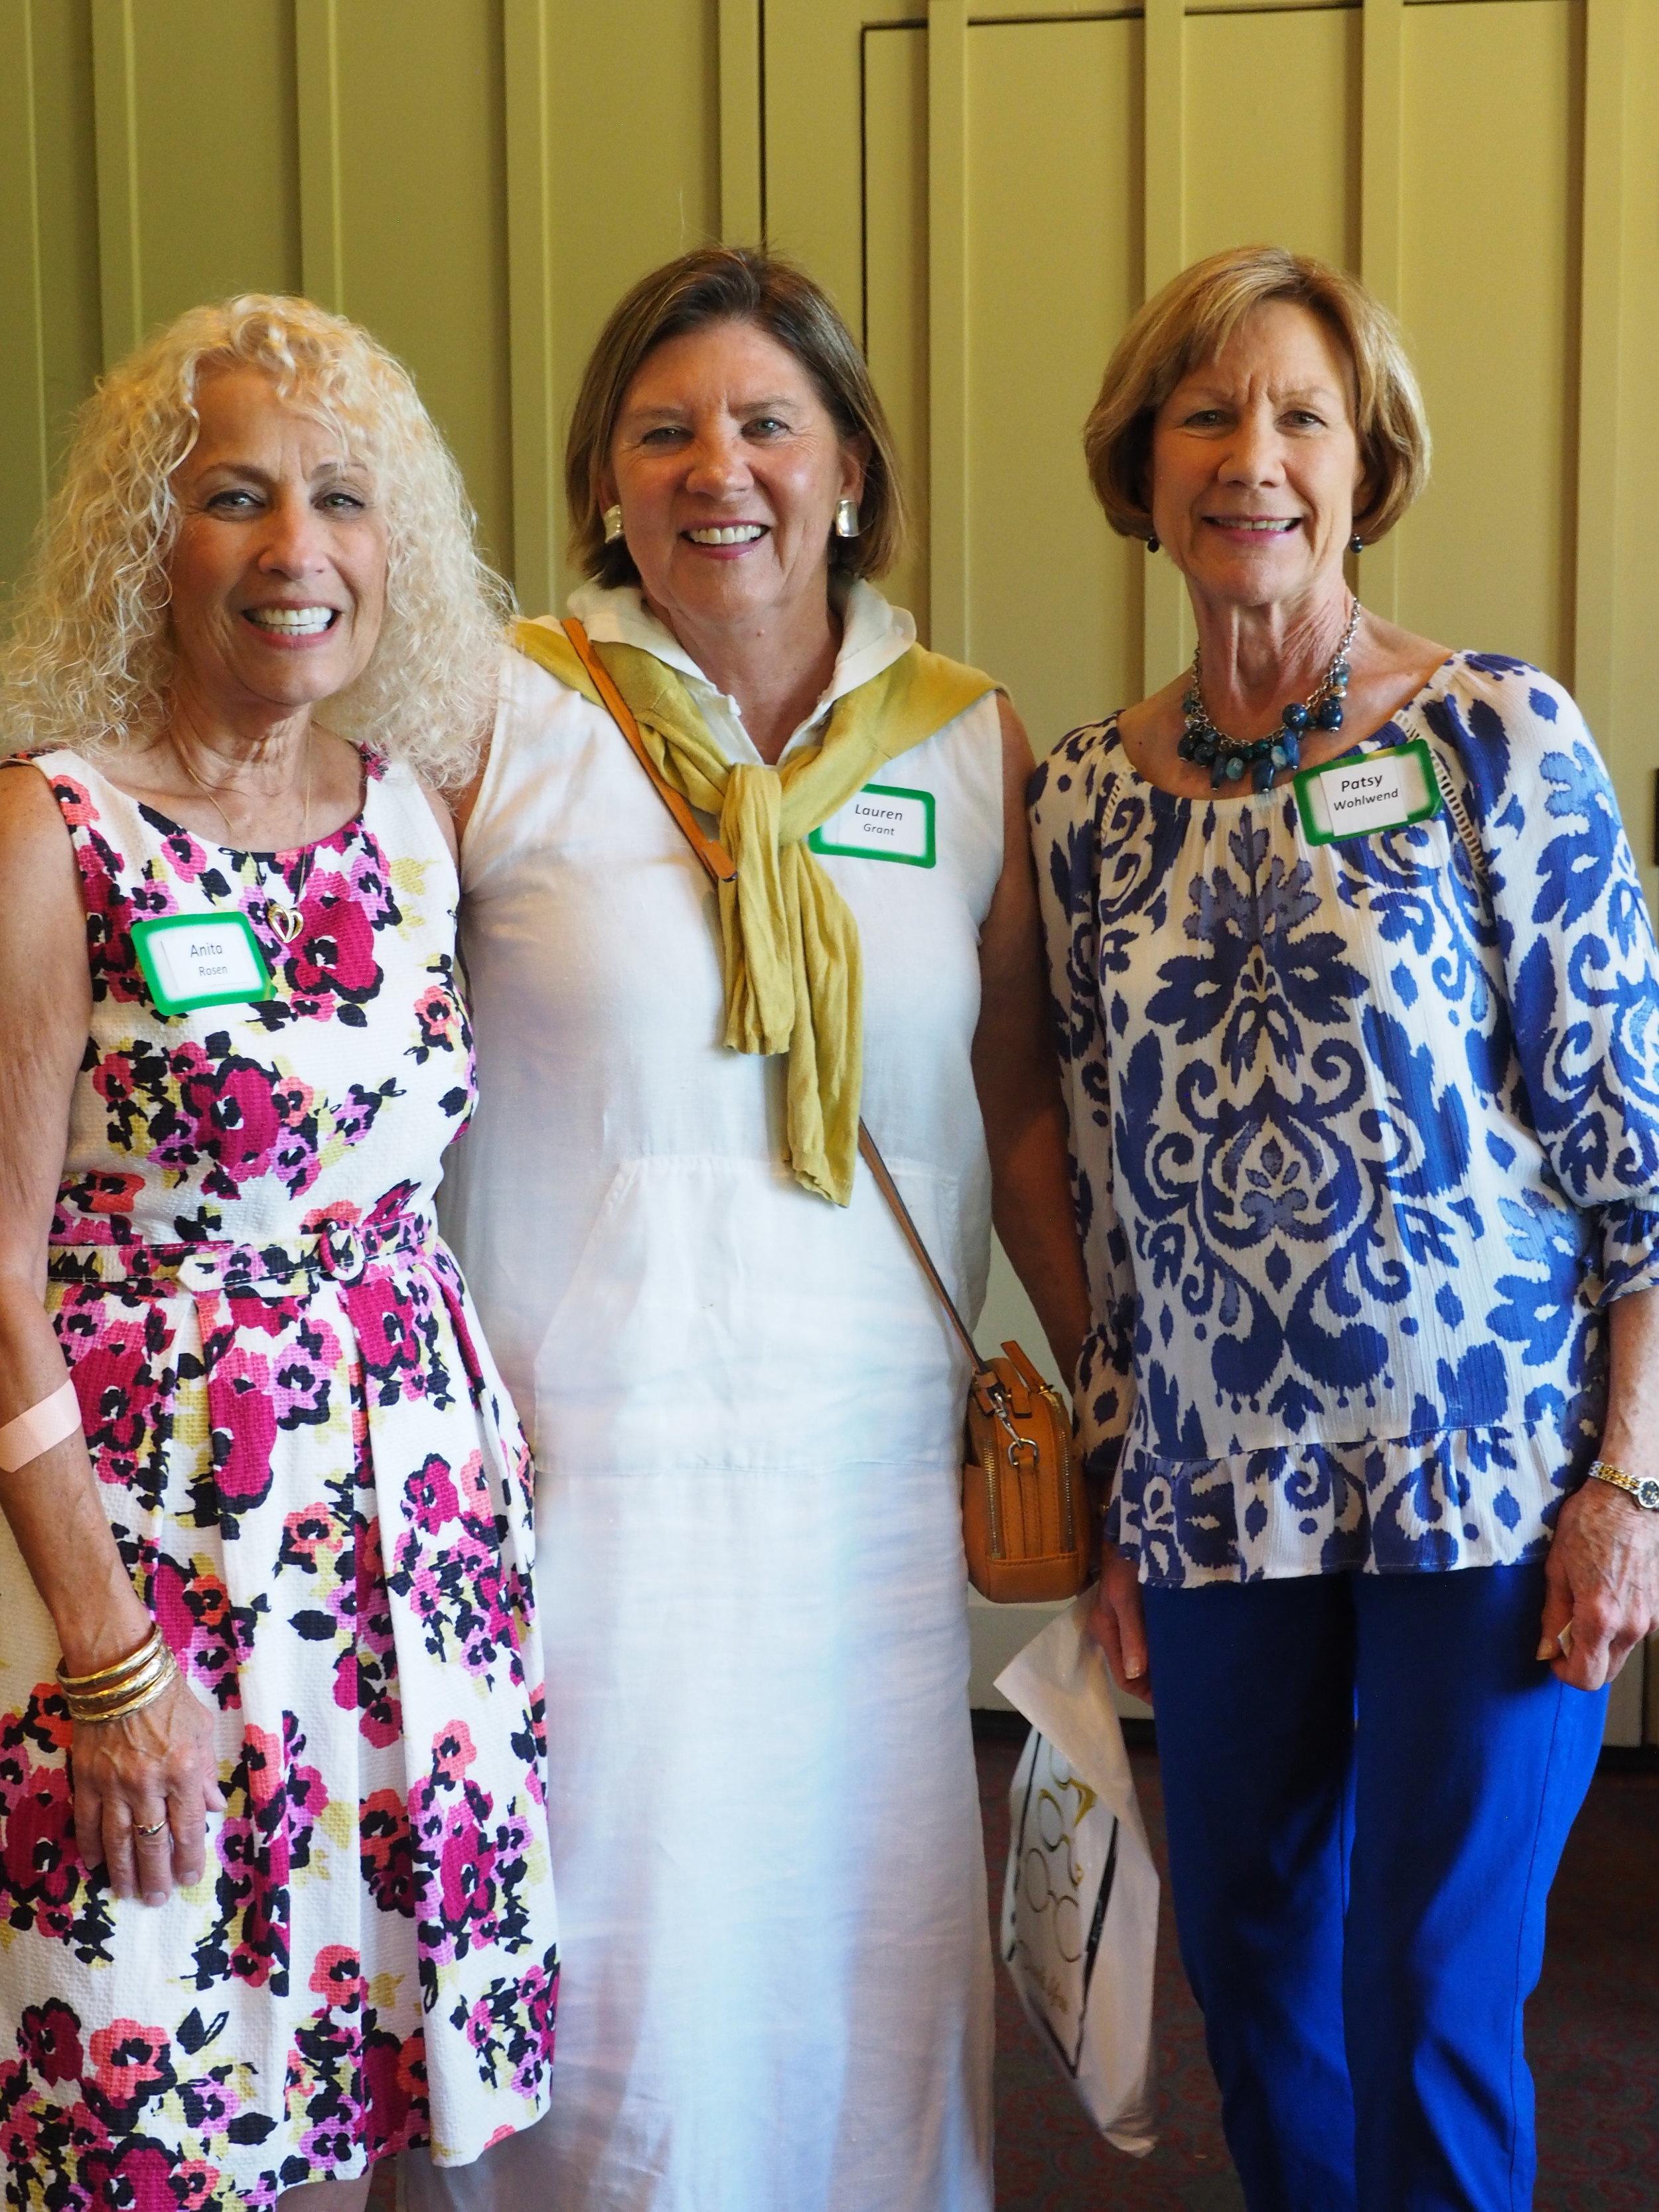 Anita Rosen, Lauren Grant and Patsy Wohlwend